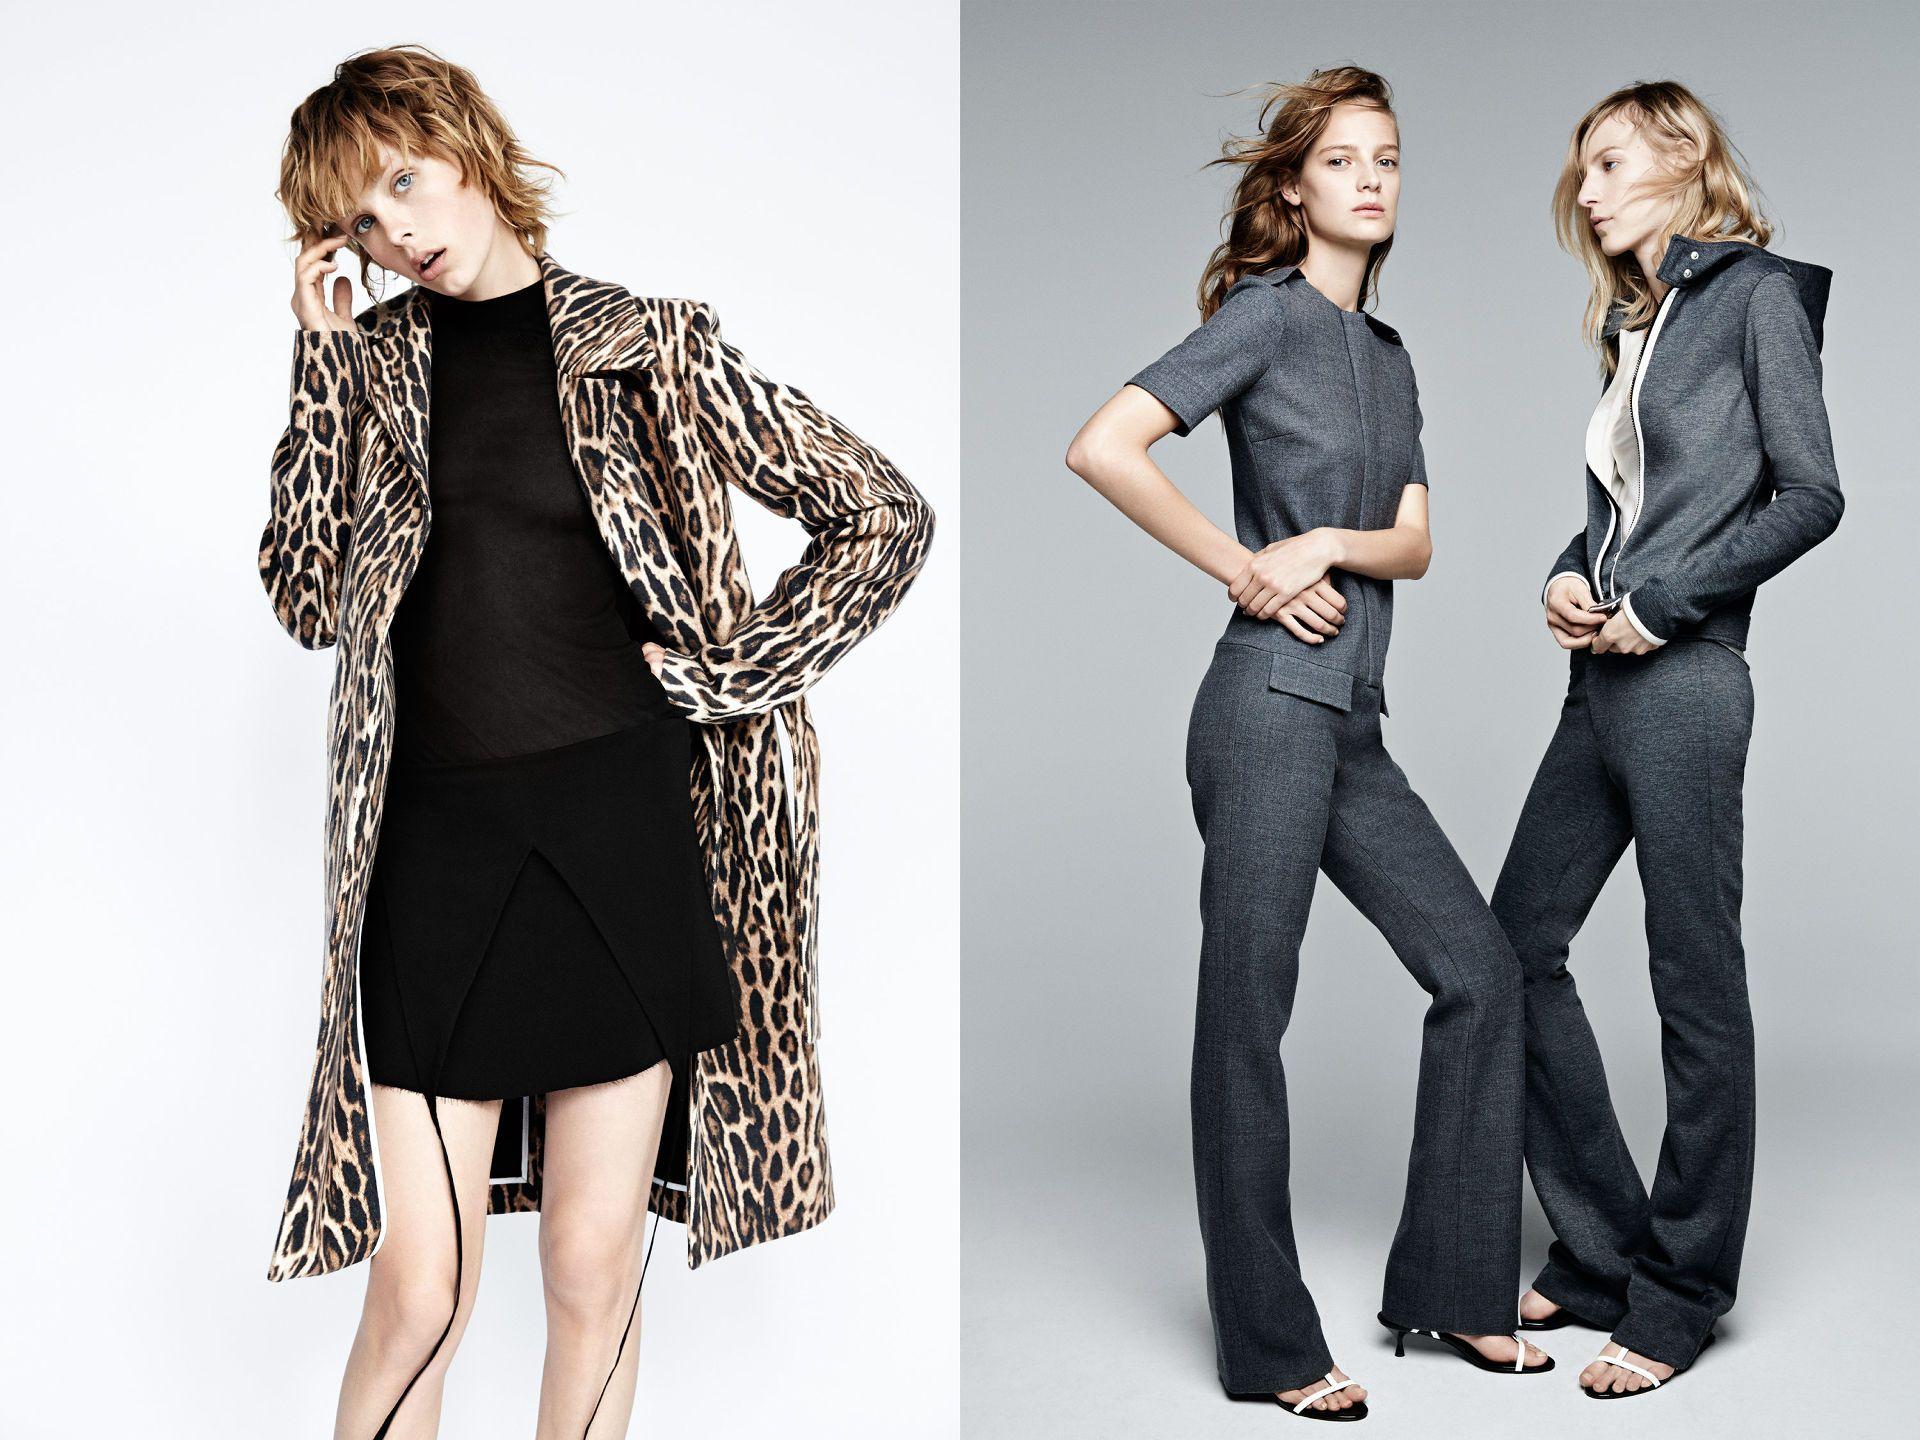 Jacket on the right | ZARA België